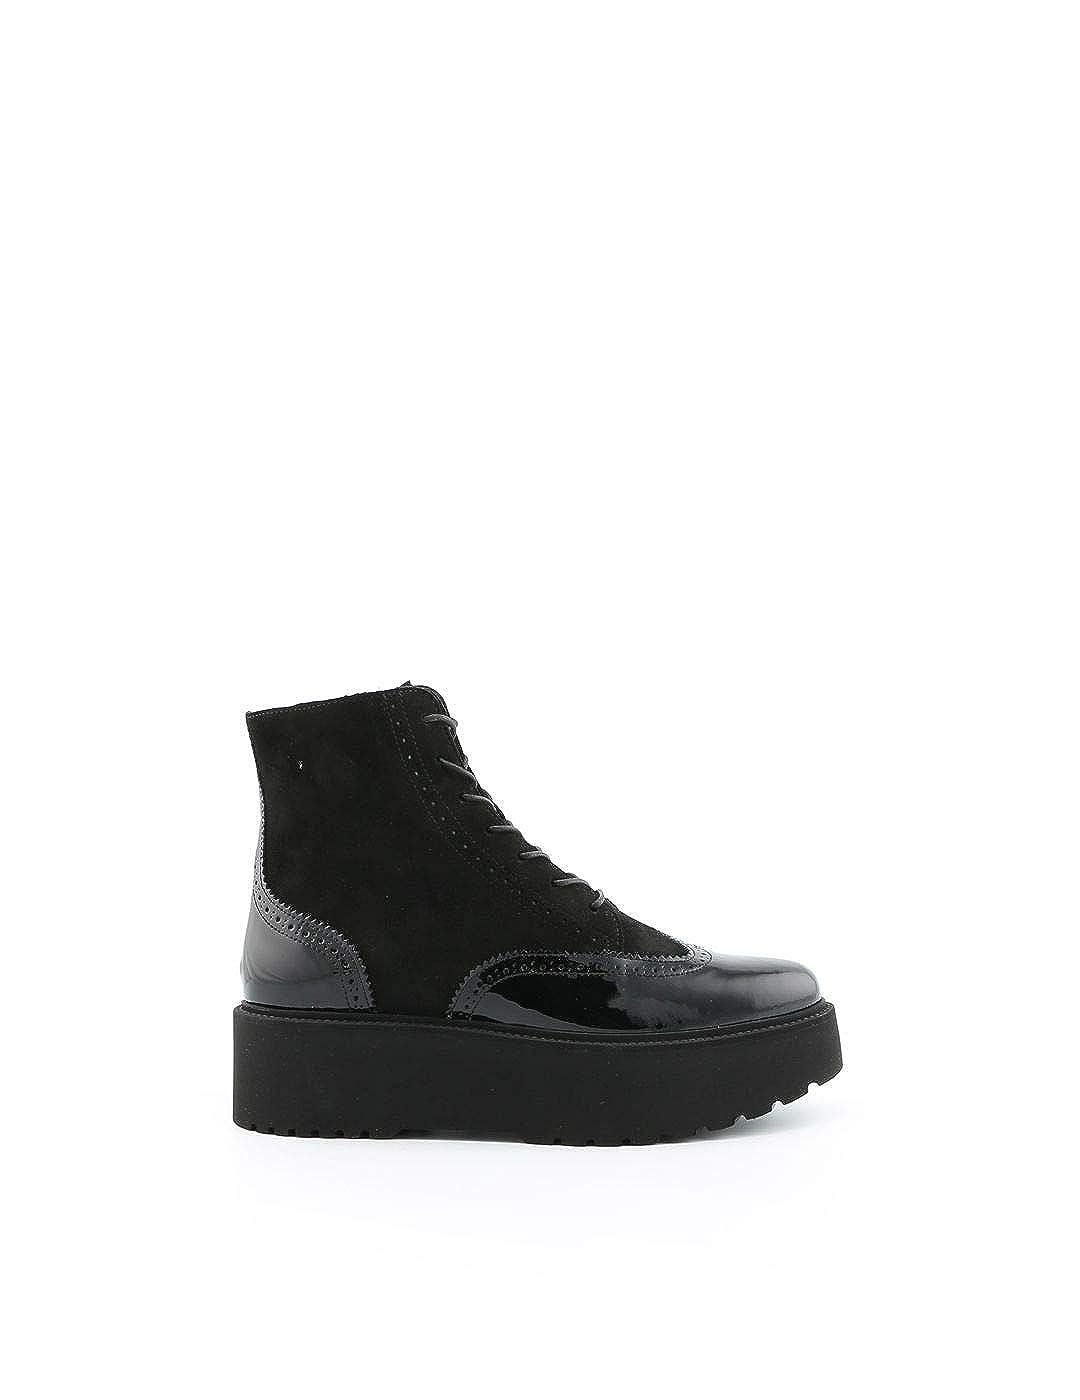 - Hogan Women's HXW3550AO1025QB999 Black Leather Ankle Boots